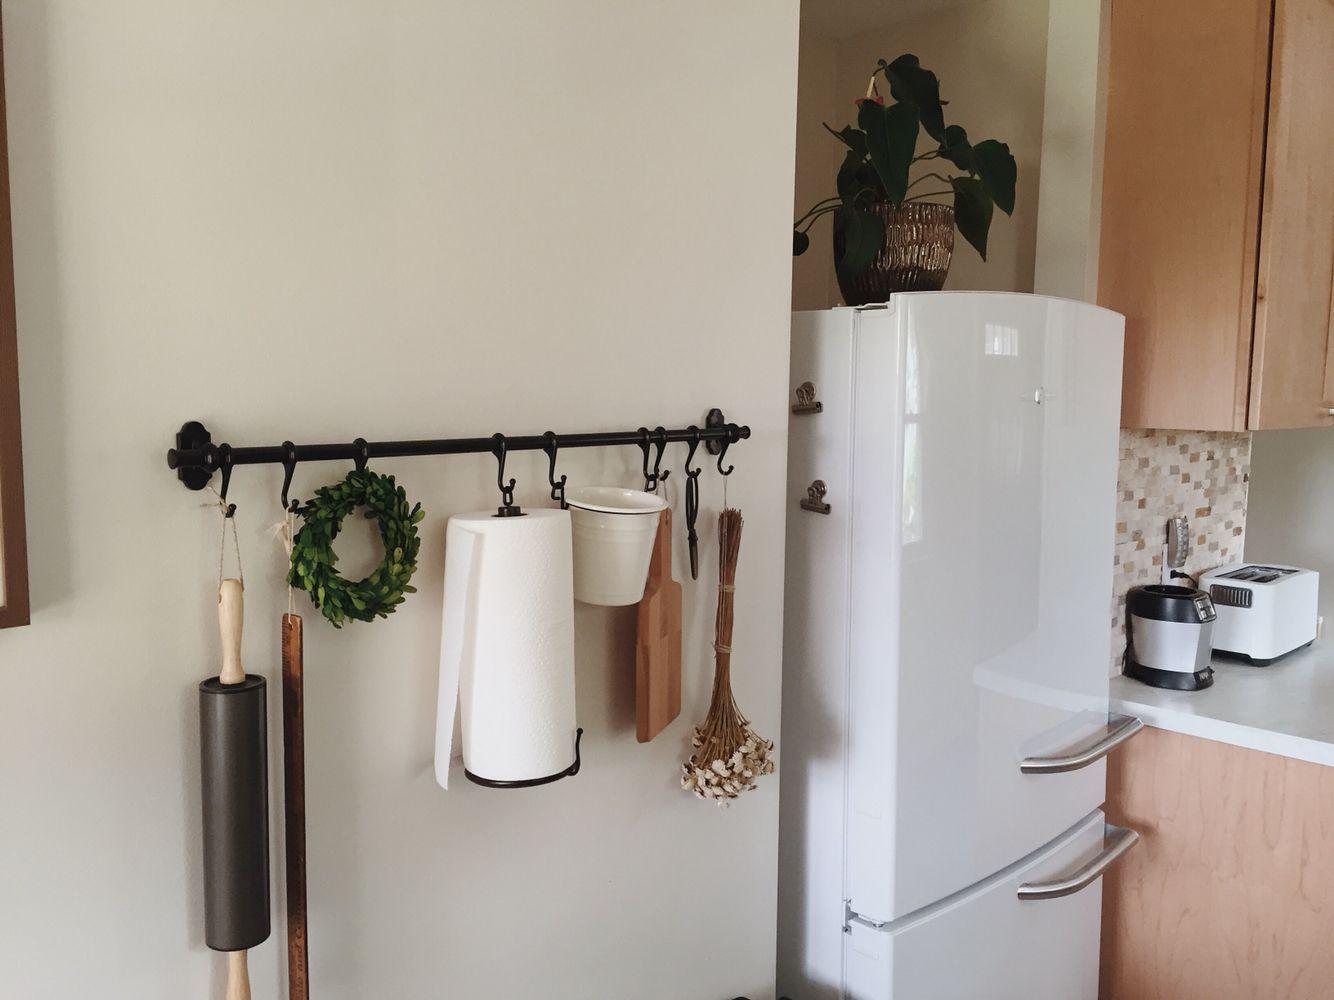 Ikea Küchenrollenhalter ~ Ikea hack paper towels foil plastic kitchen